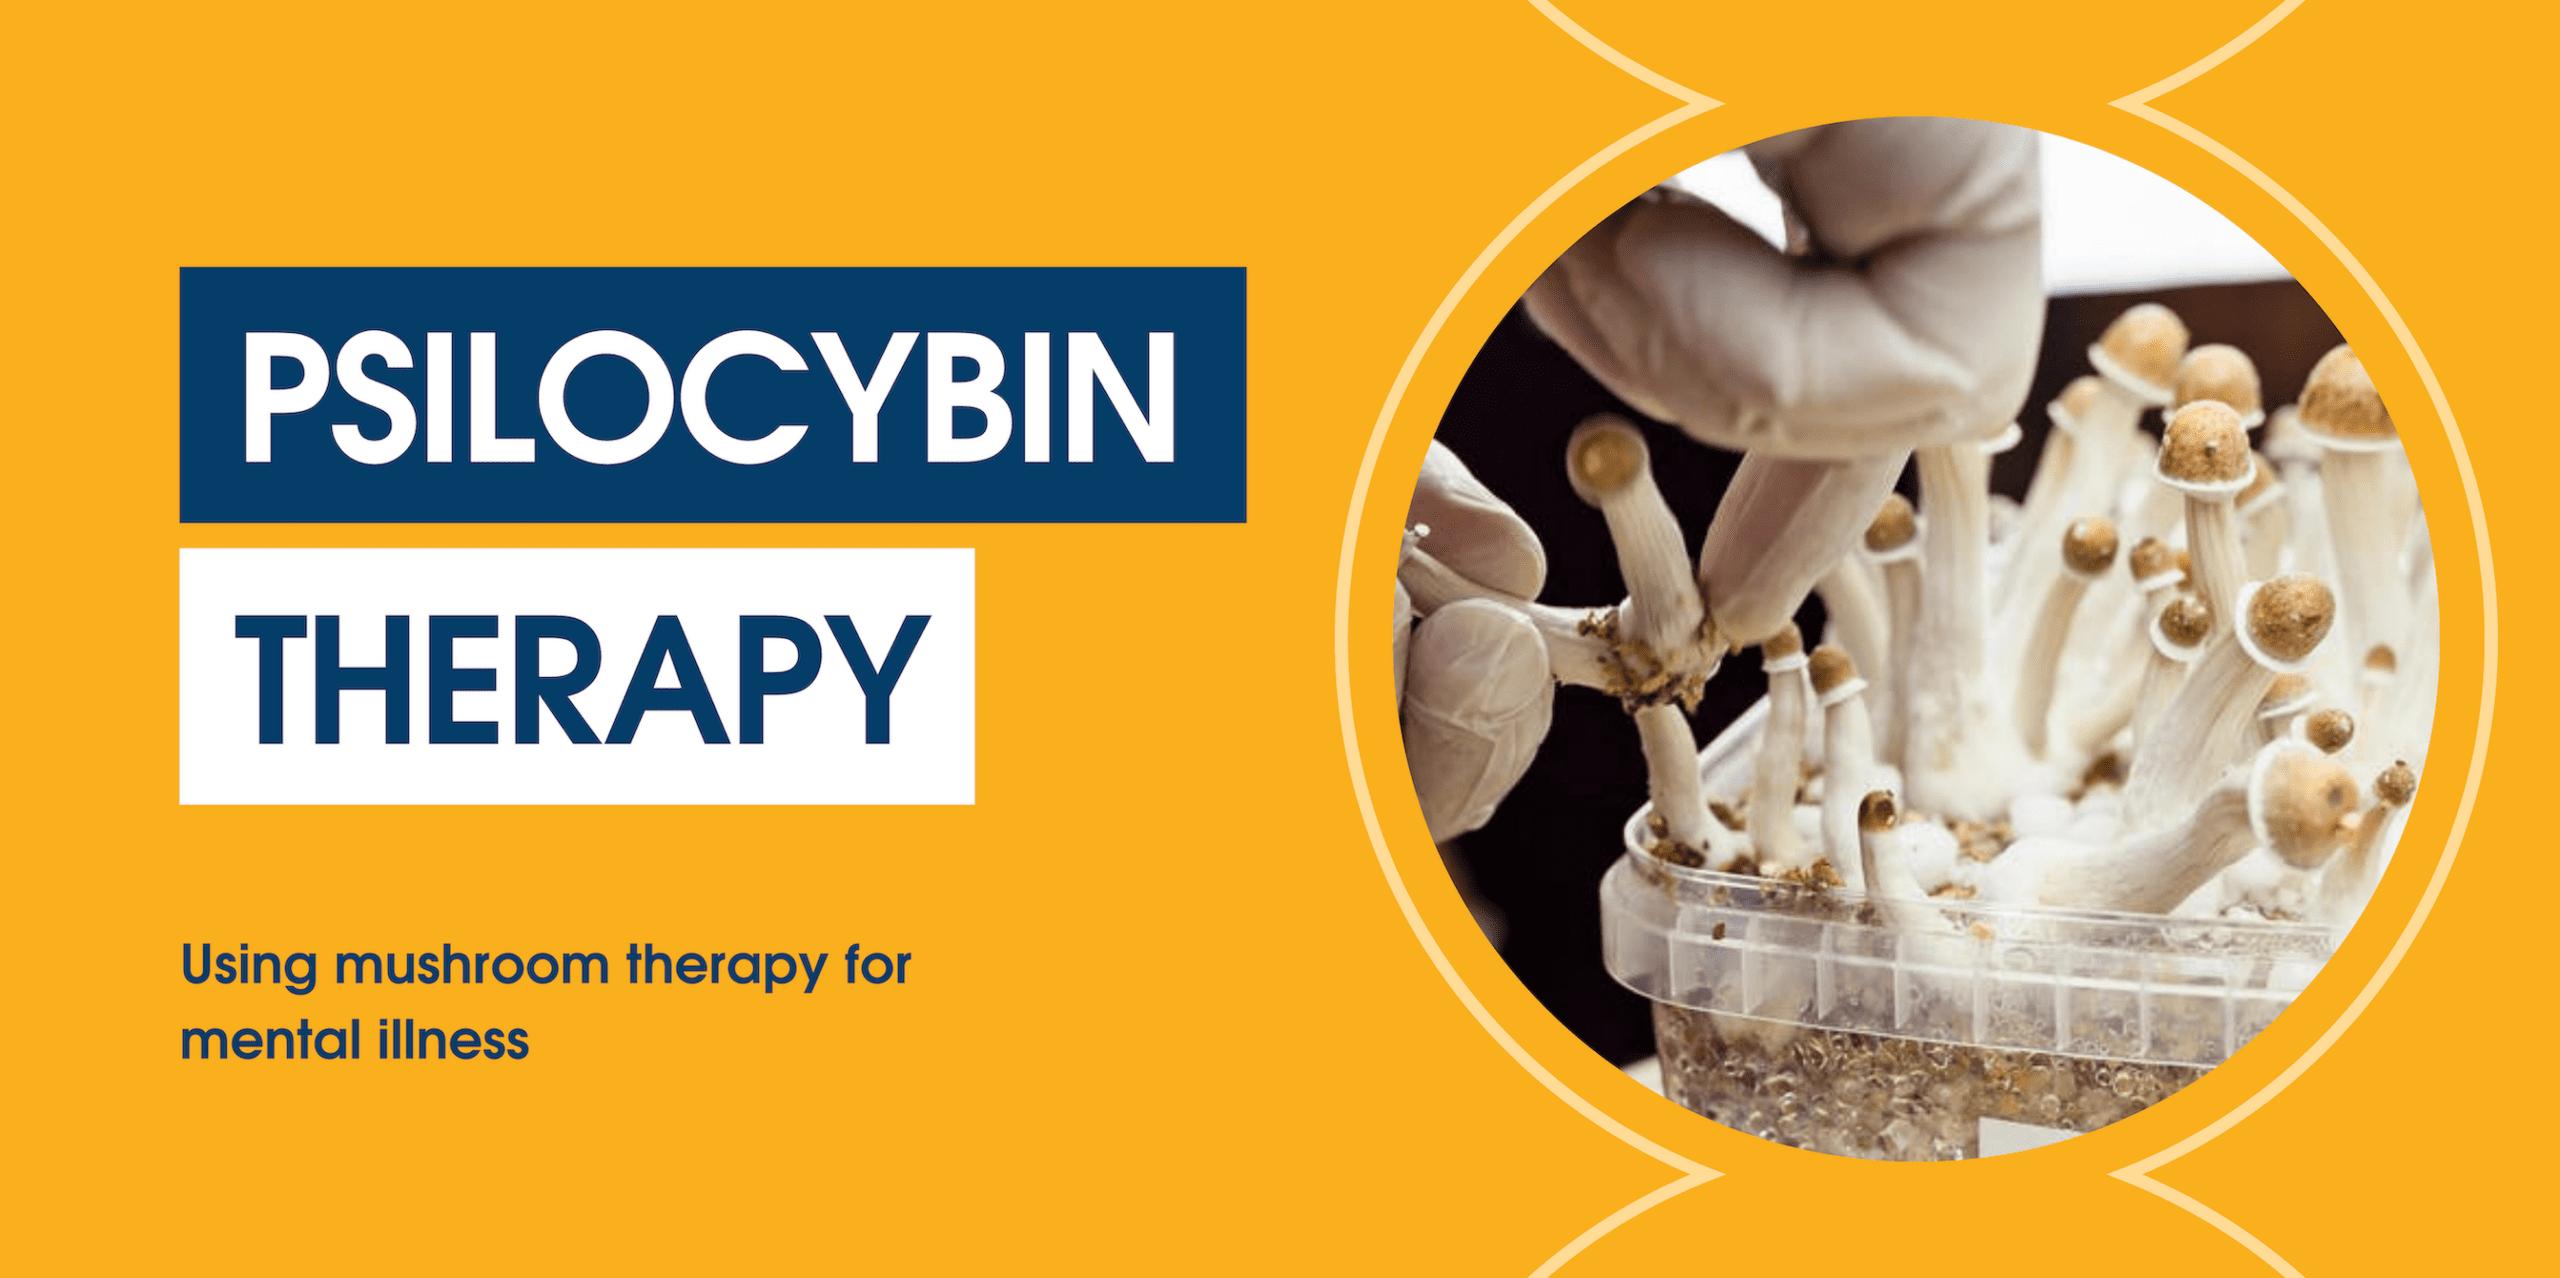 Psilocybin Therapy